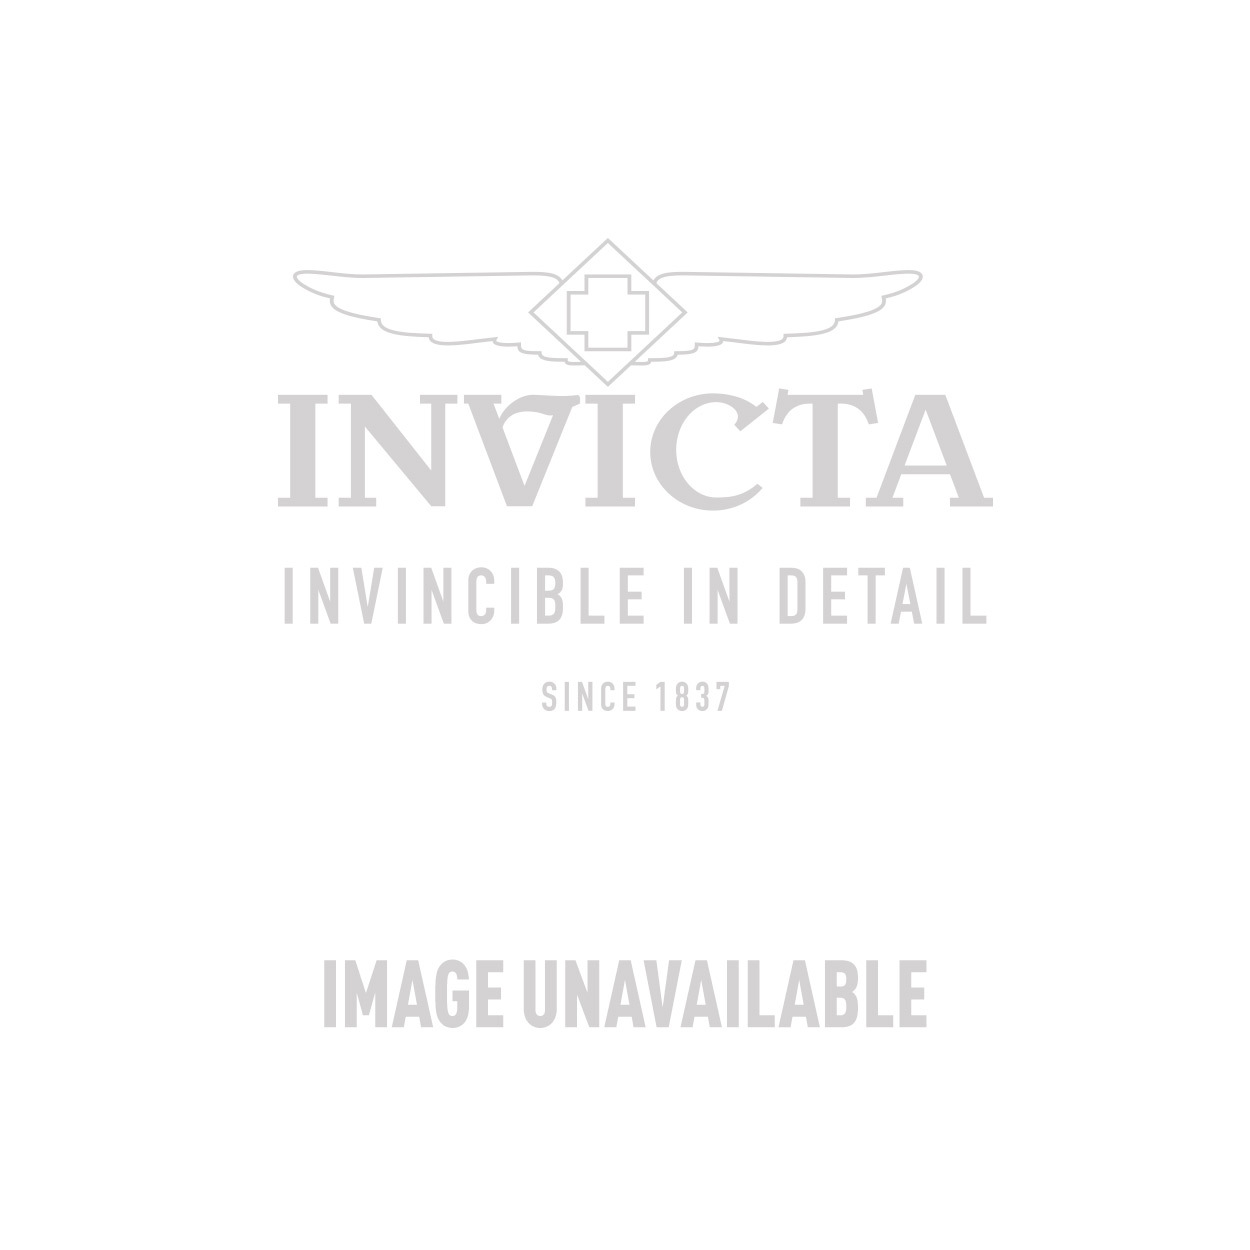 Invicta Venom Swiss Made Quartz Watch - Titanium, Stainless Steel case with Steel, Black tone Stainless Steel, Polyurethane band - Model 16310